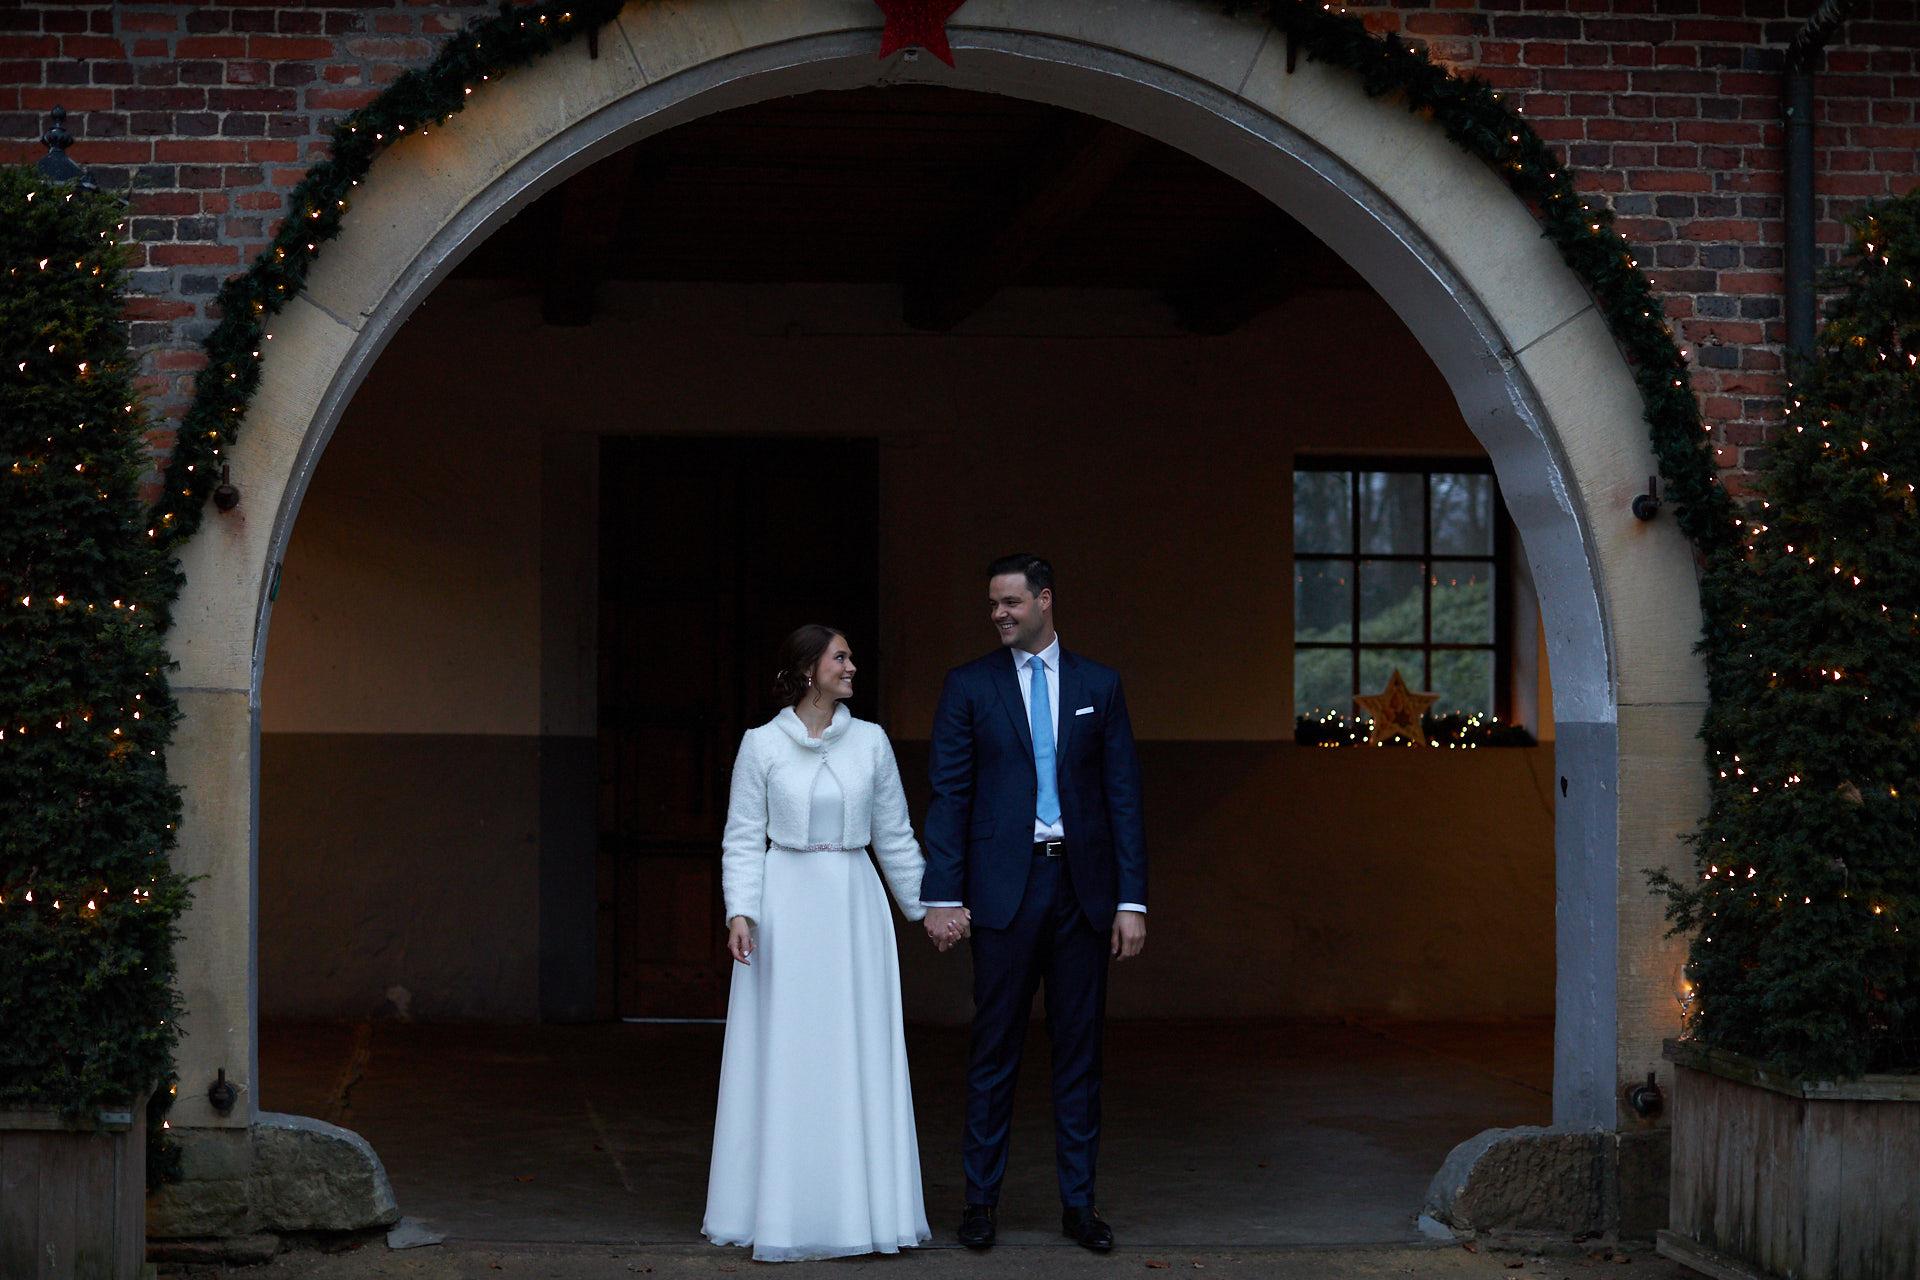 2019-12-20 Laura & Robin - Alena and Daniel Weddings 0458 1